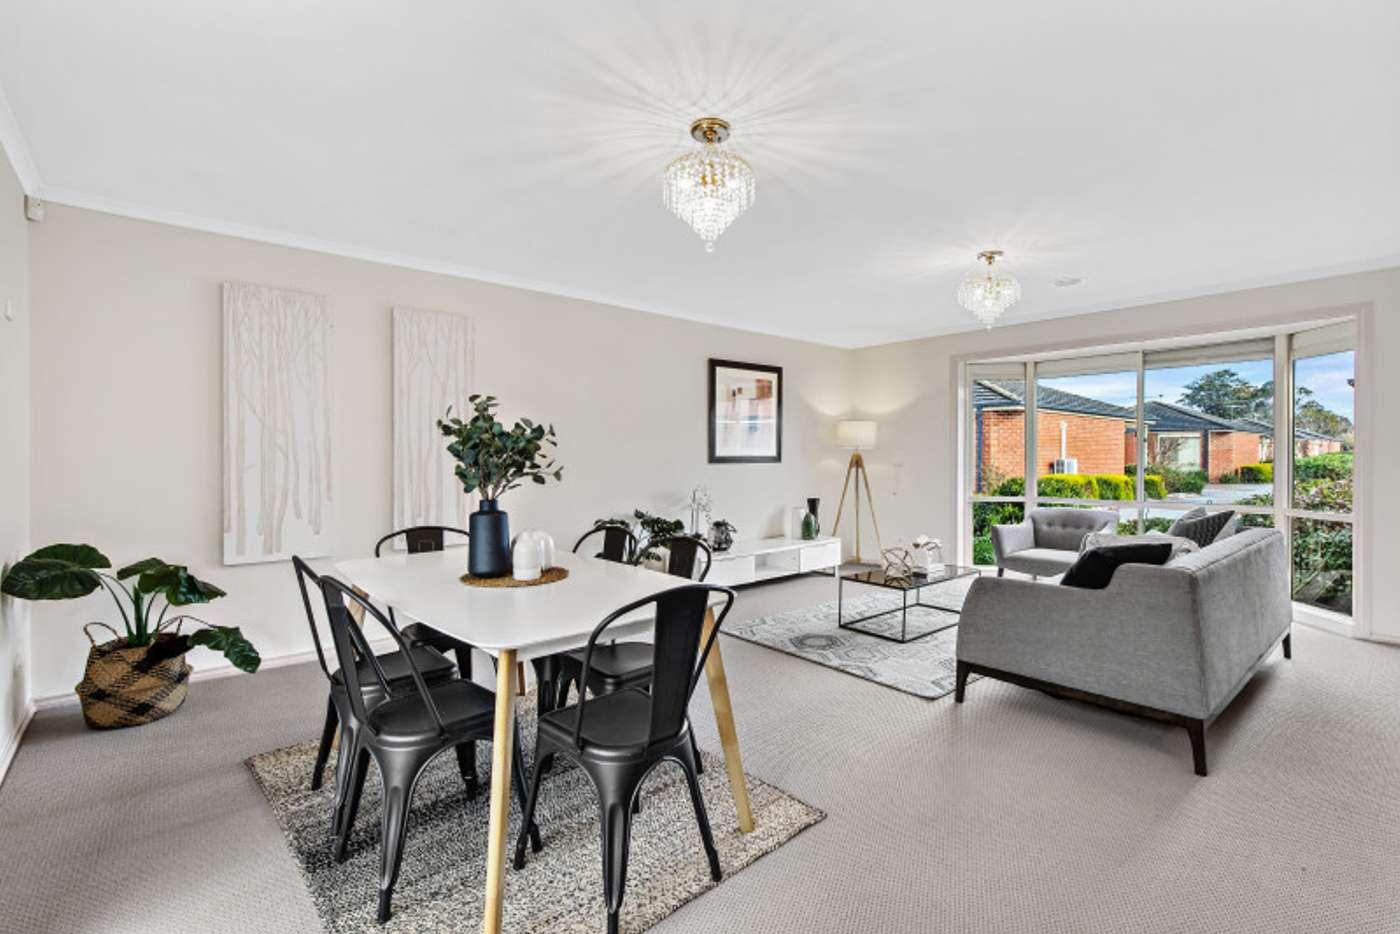 Fifth view of Homely unit listing, 5/11 King Street, Pakenham VIC 3810